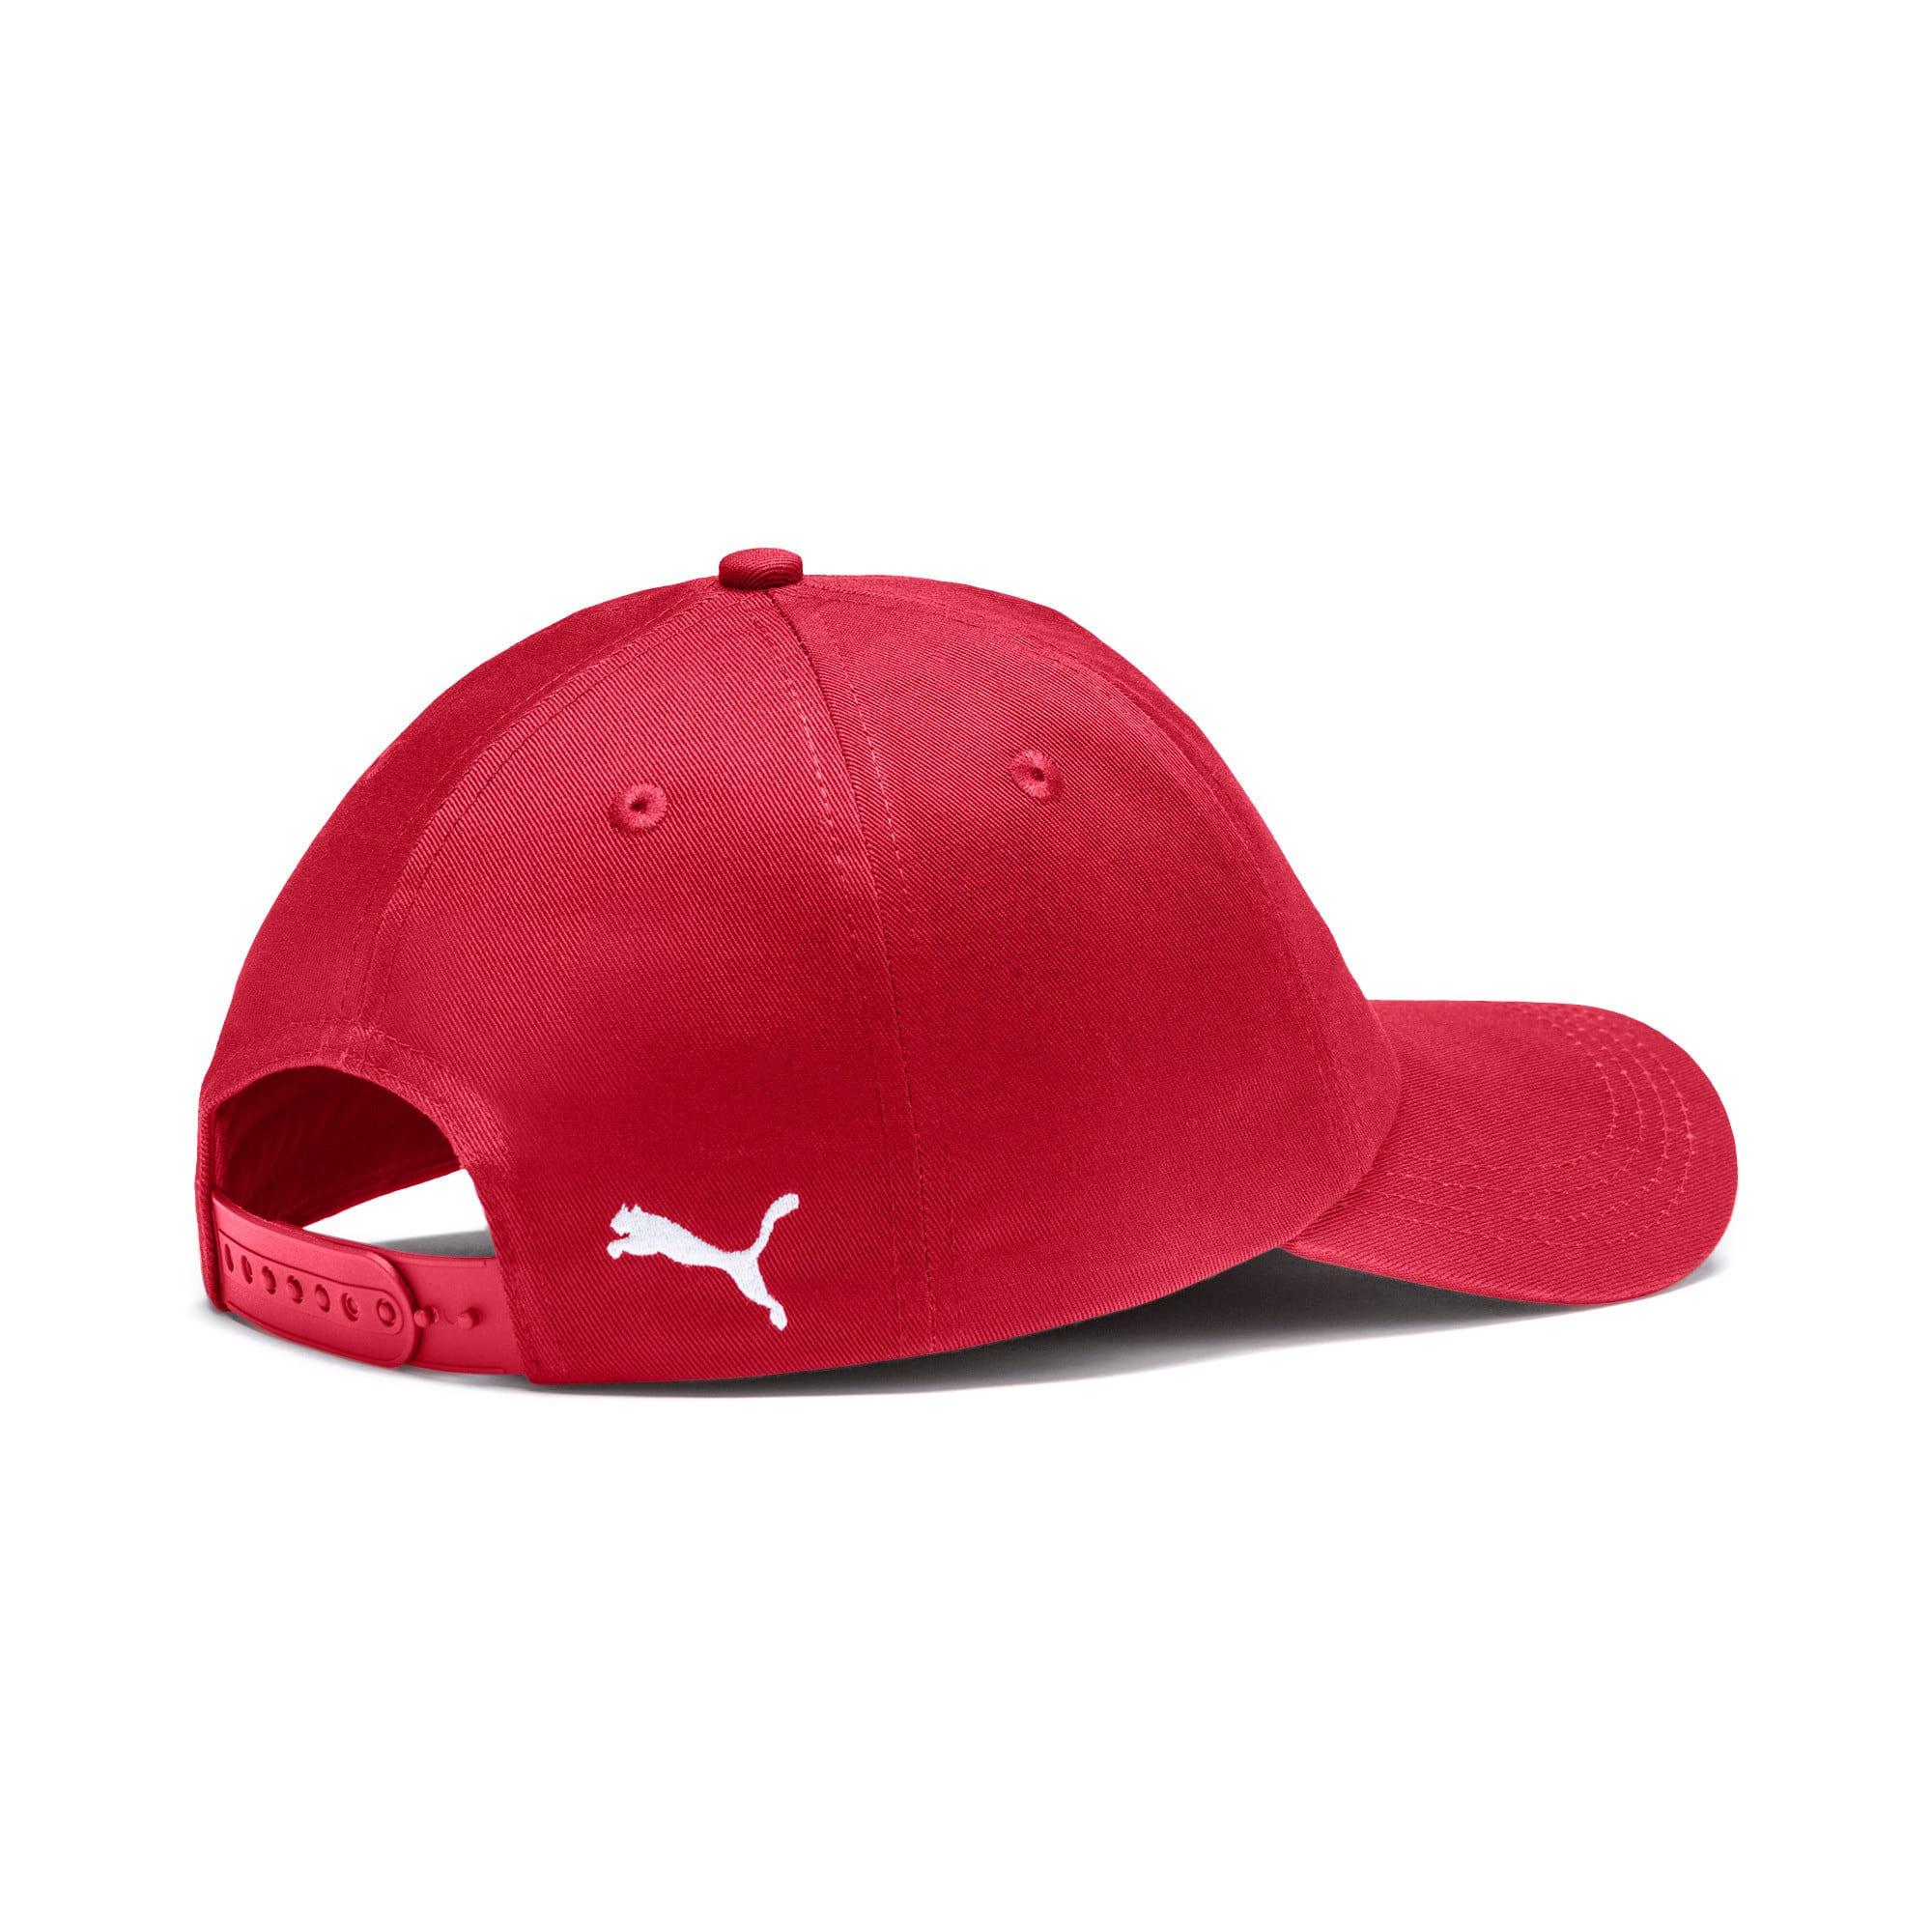 Thumbnail 2 of AFC Training Hat, Pomegranate-Peacoat, medium